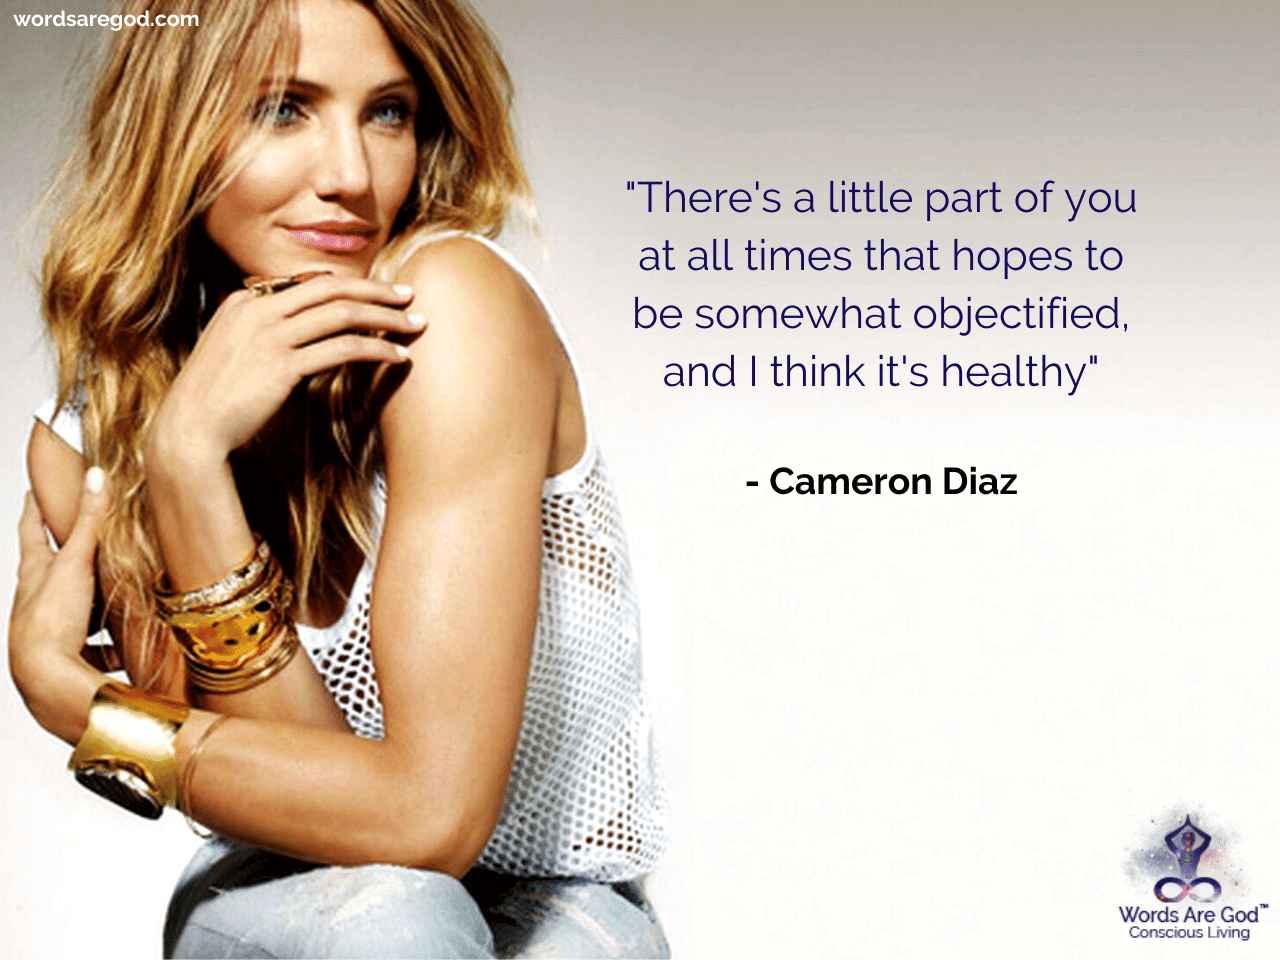 Cameron Diaz Romantic Quote by Cameron Diaz